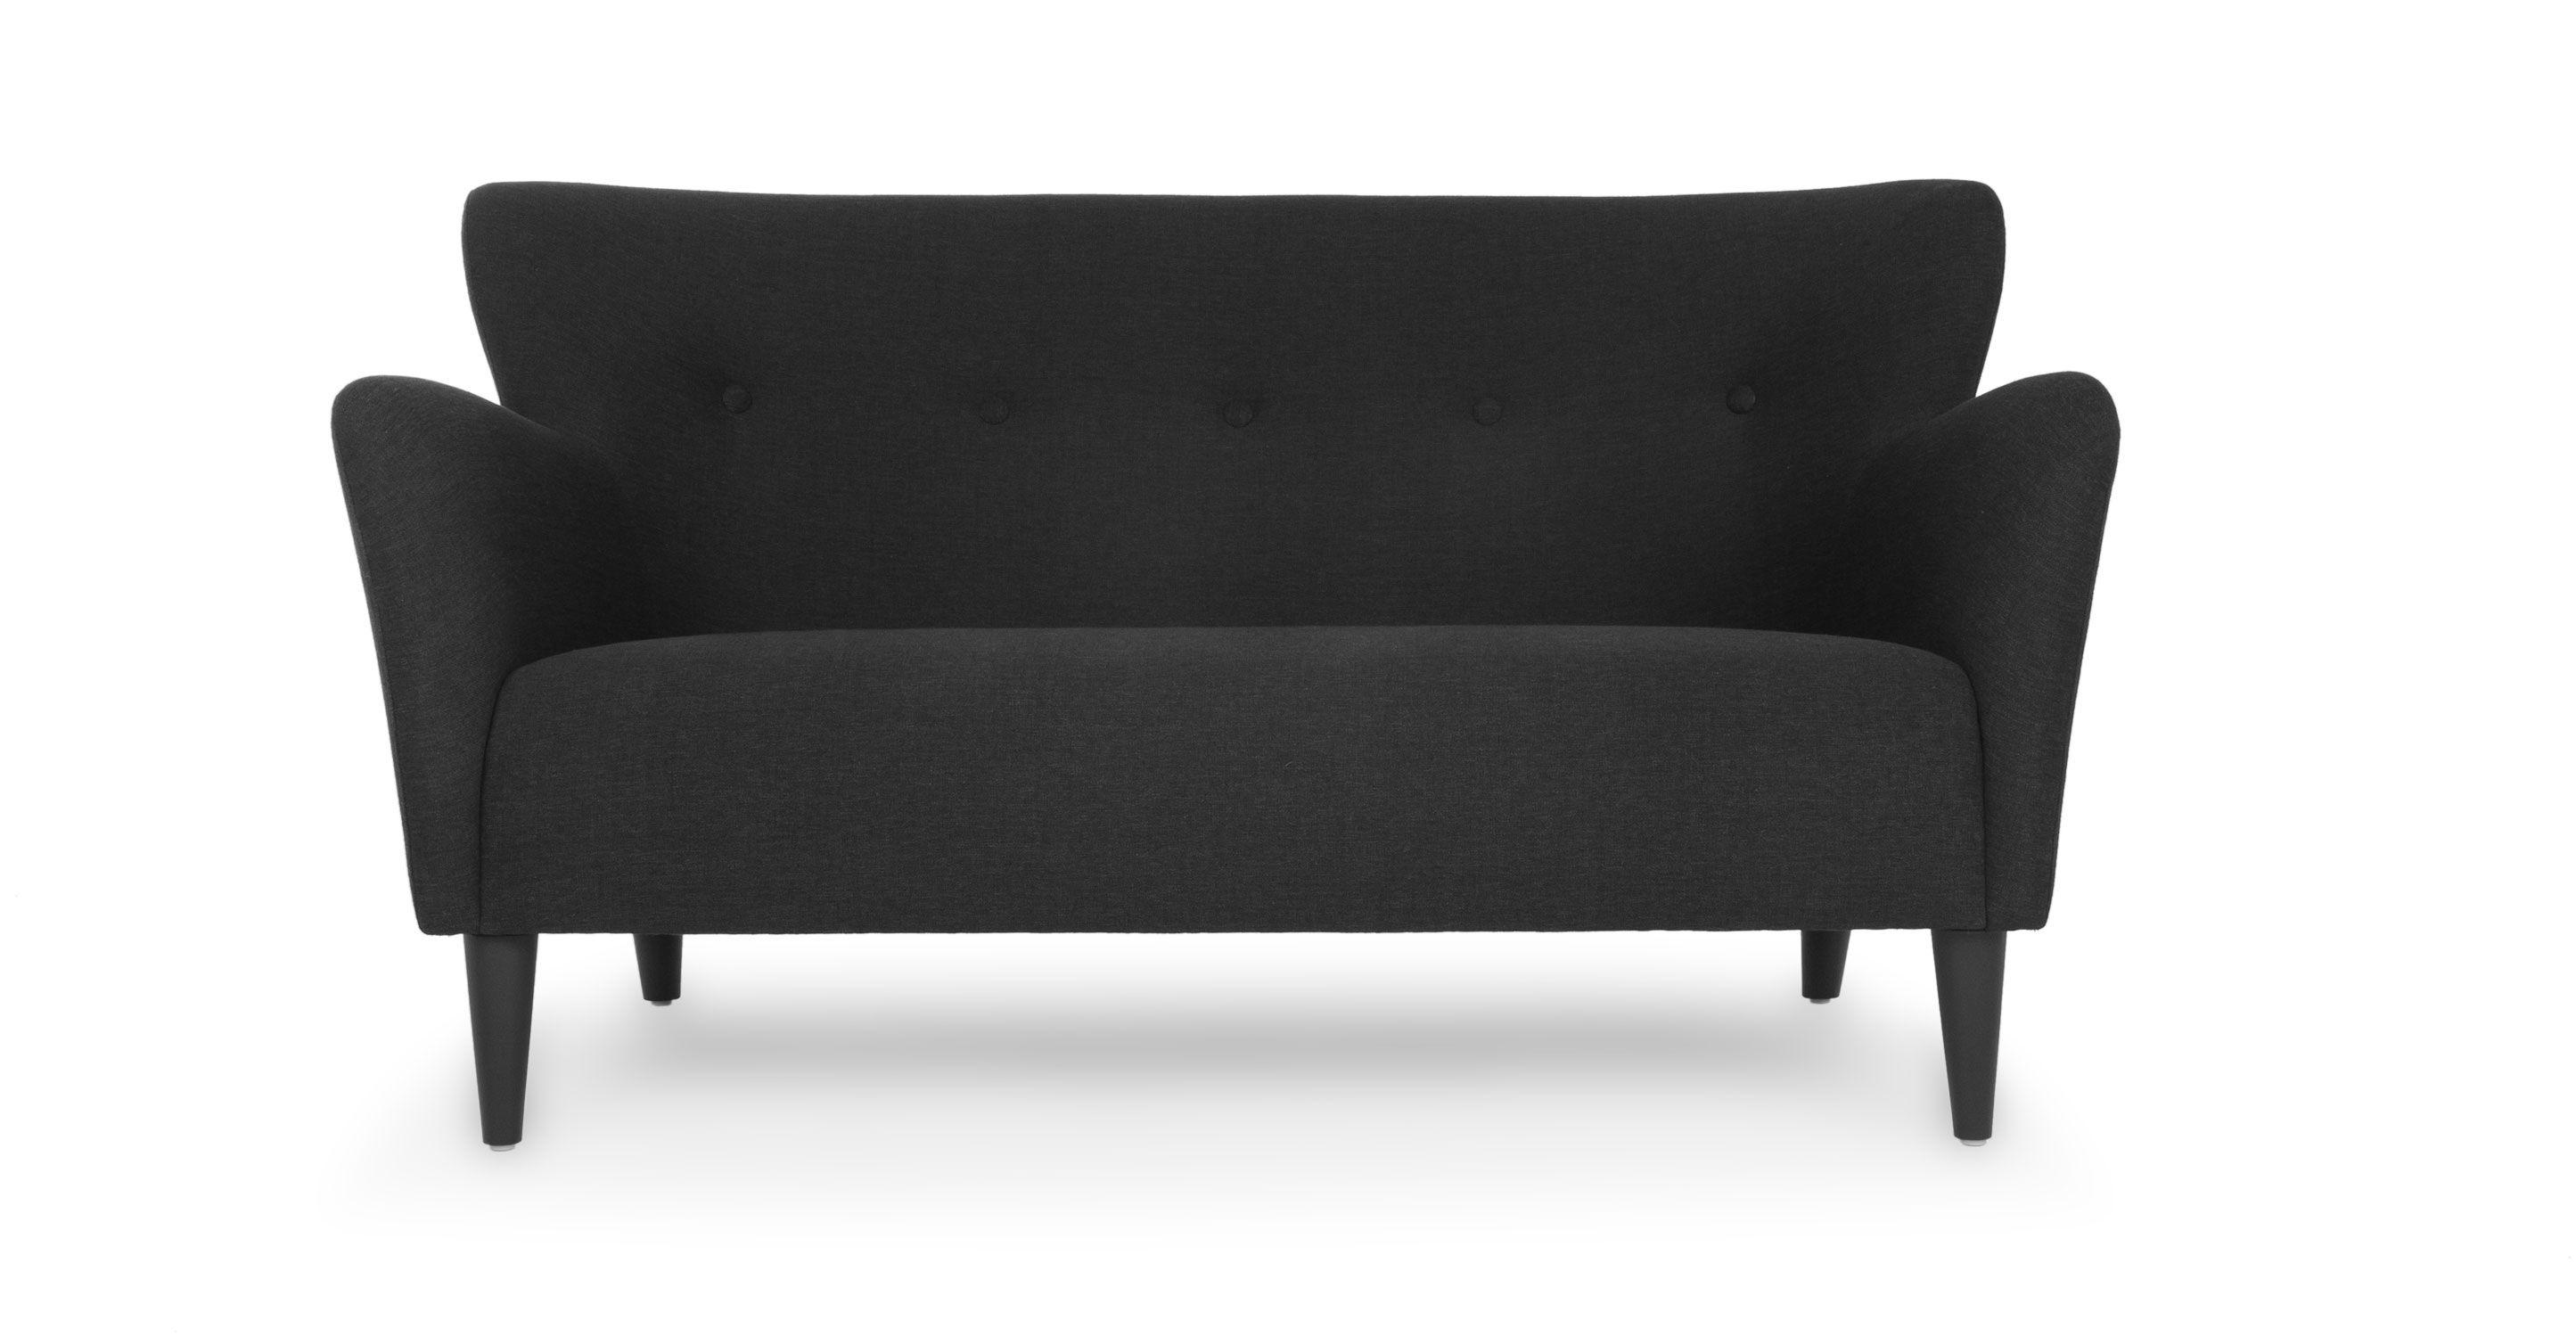 Happy Charcoal Gray Loveseat Scandinavian furniture Loveseats